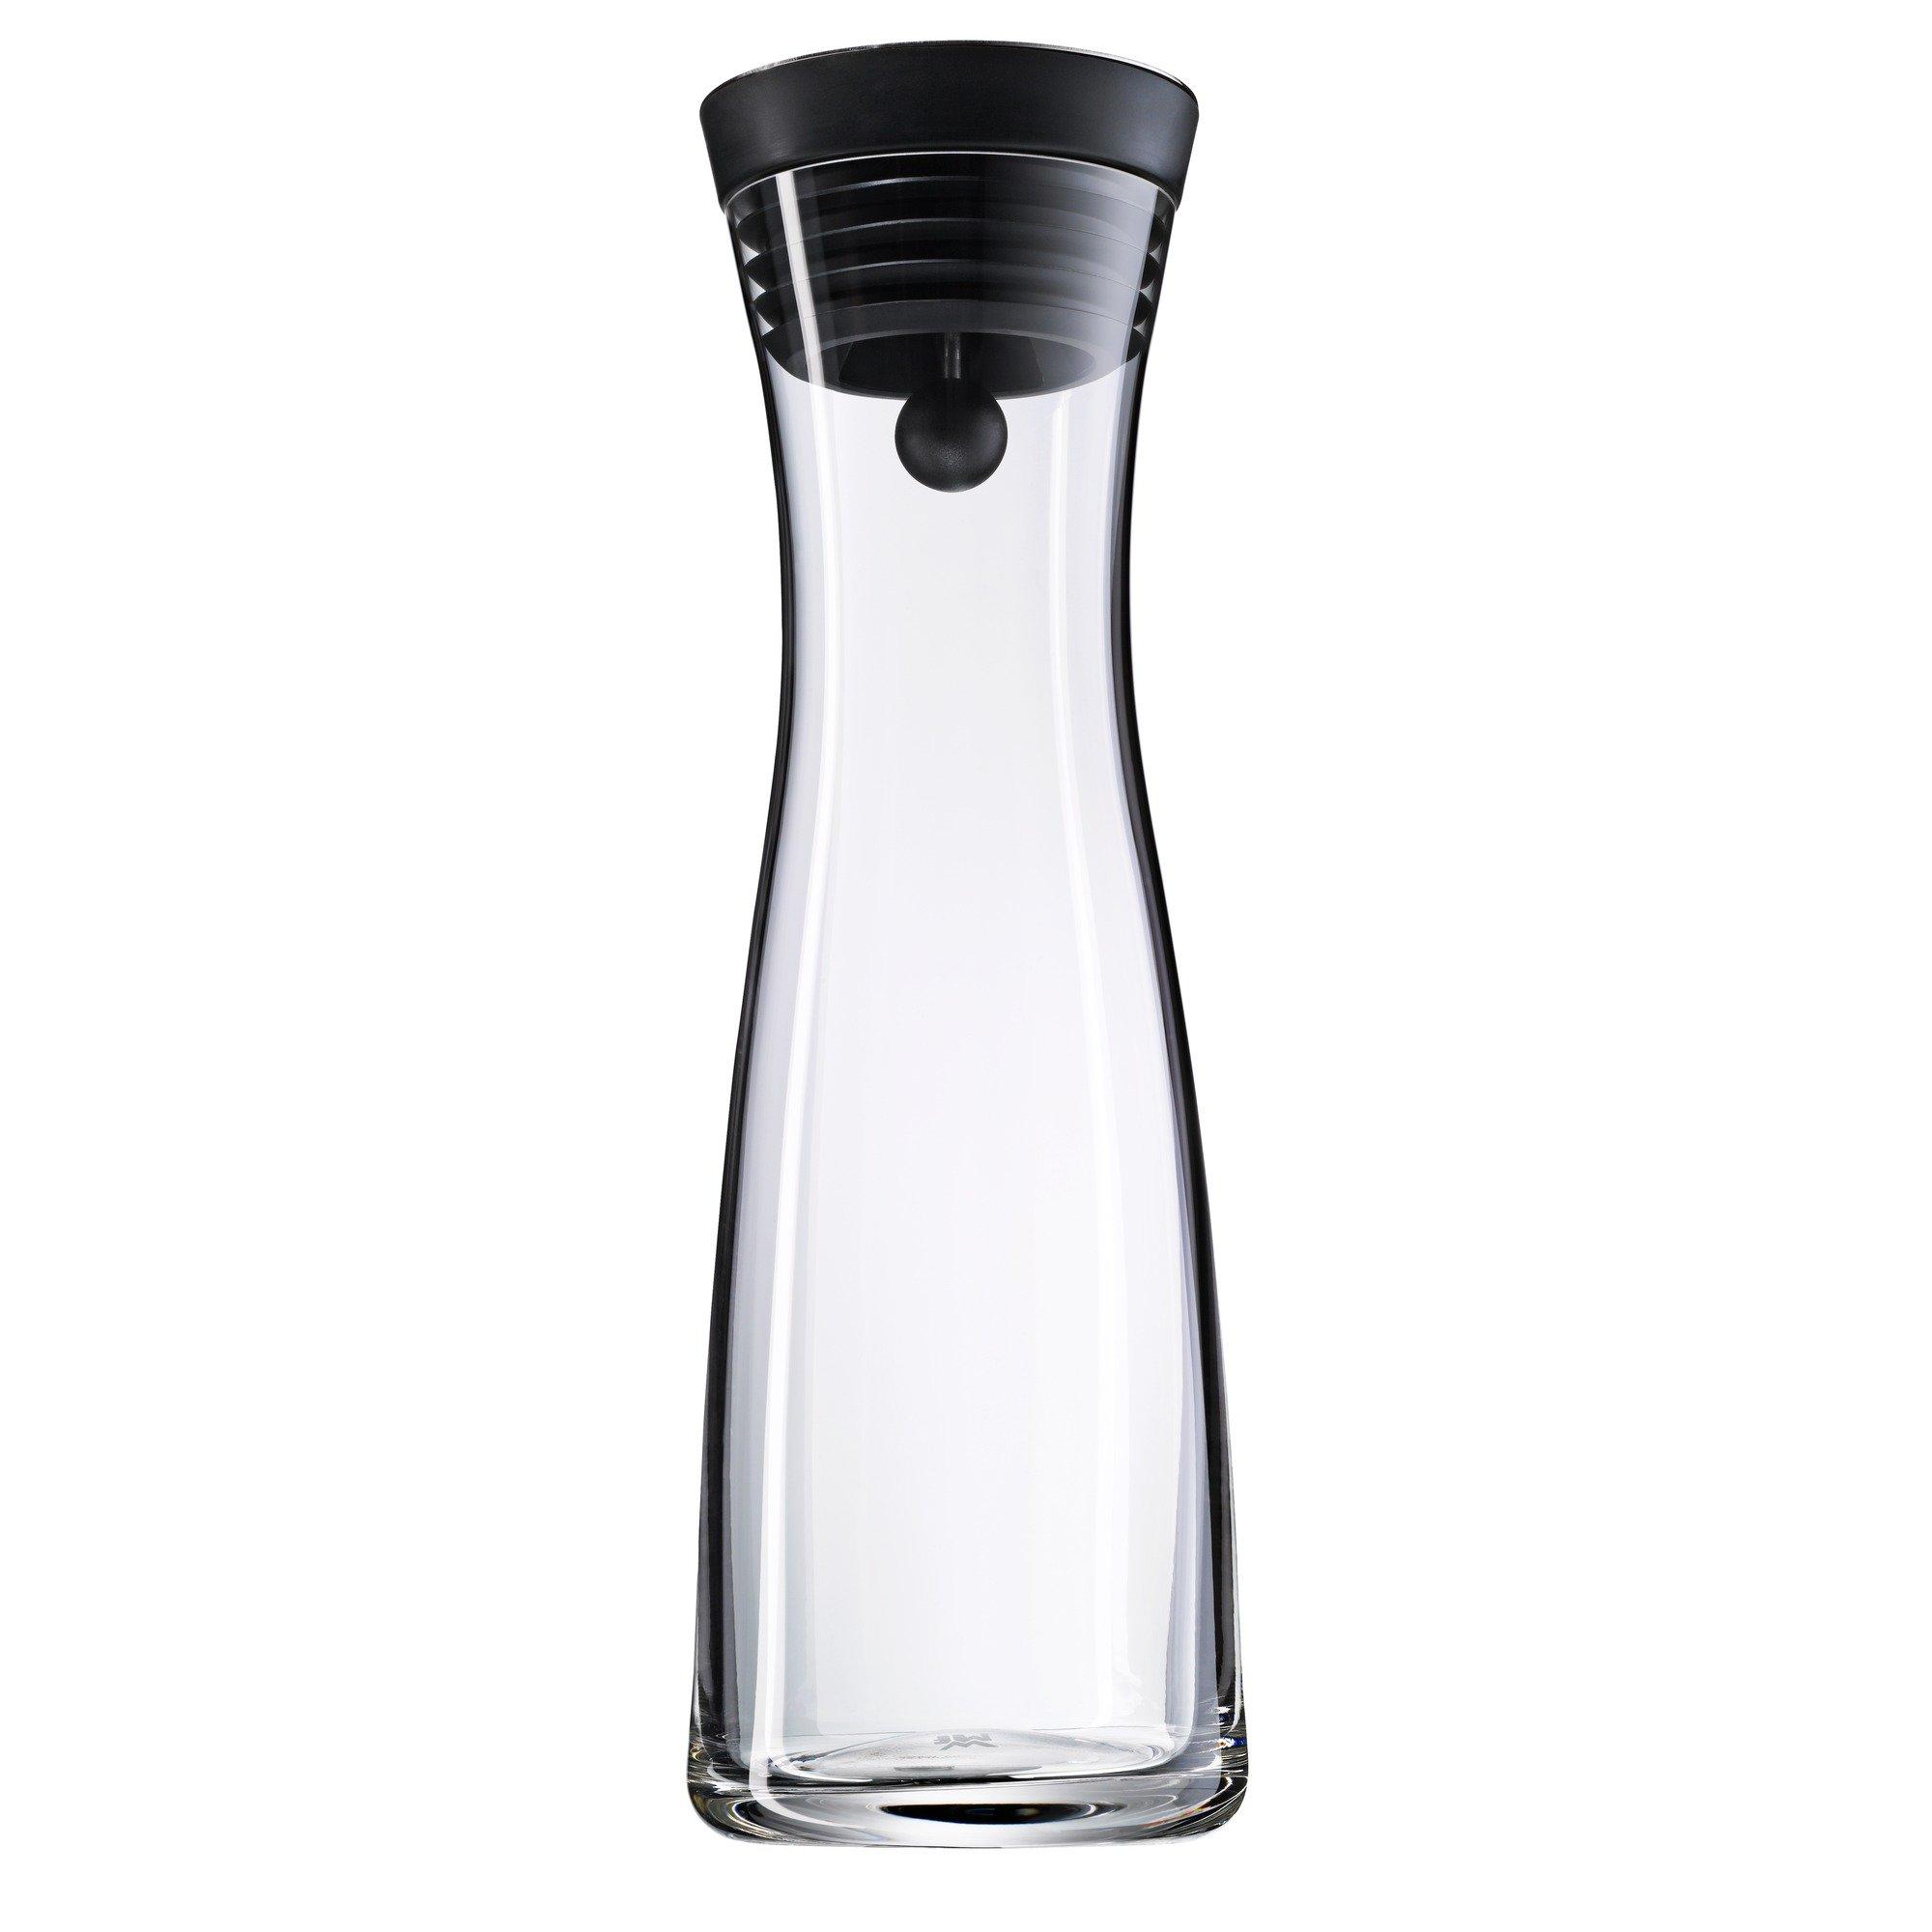 Wasserkaraffe 1,0 l schwarz Basic